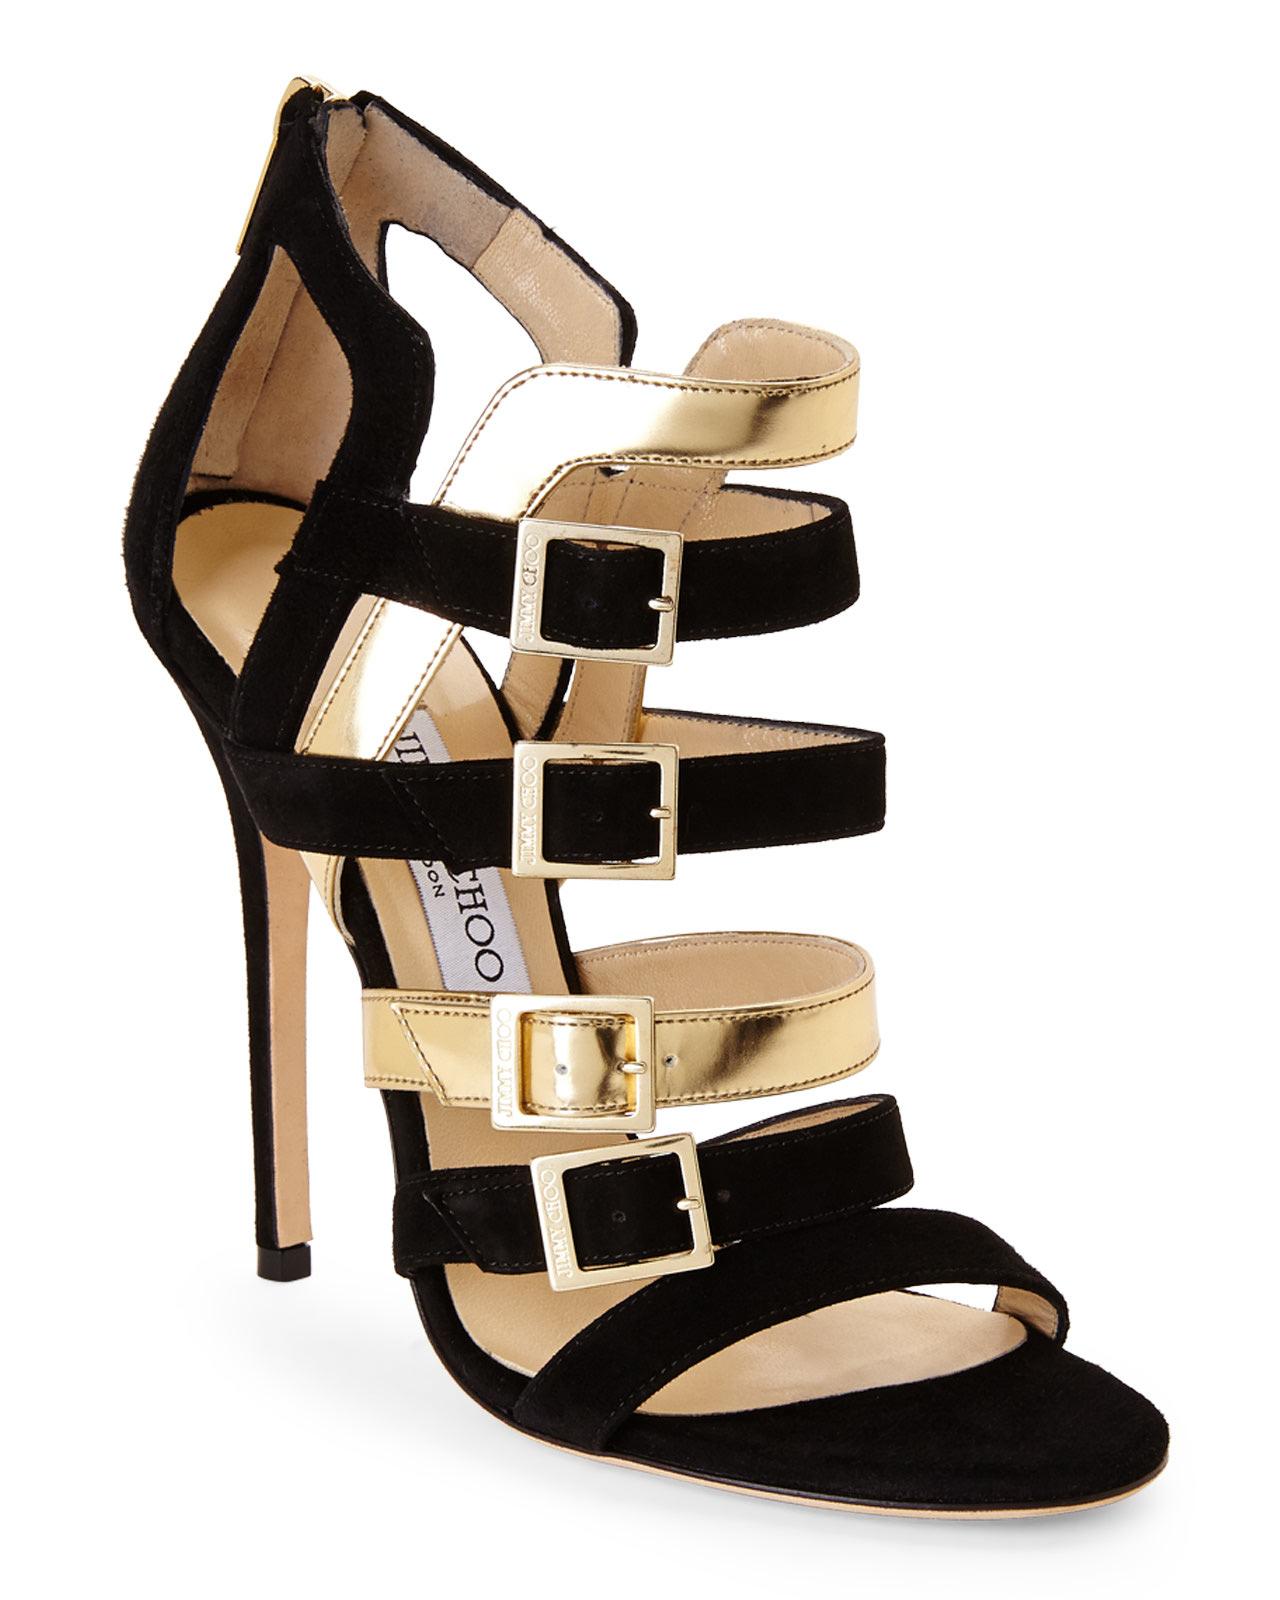 8897c543bdc Lyst - Jimmy Choo Black   Gold Booster Sandals in Black